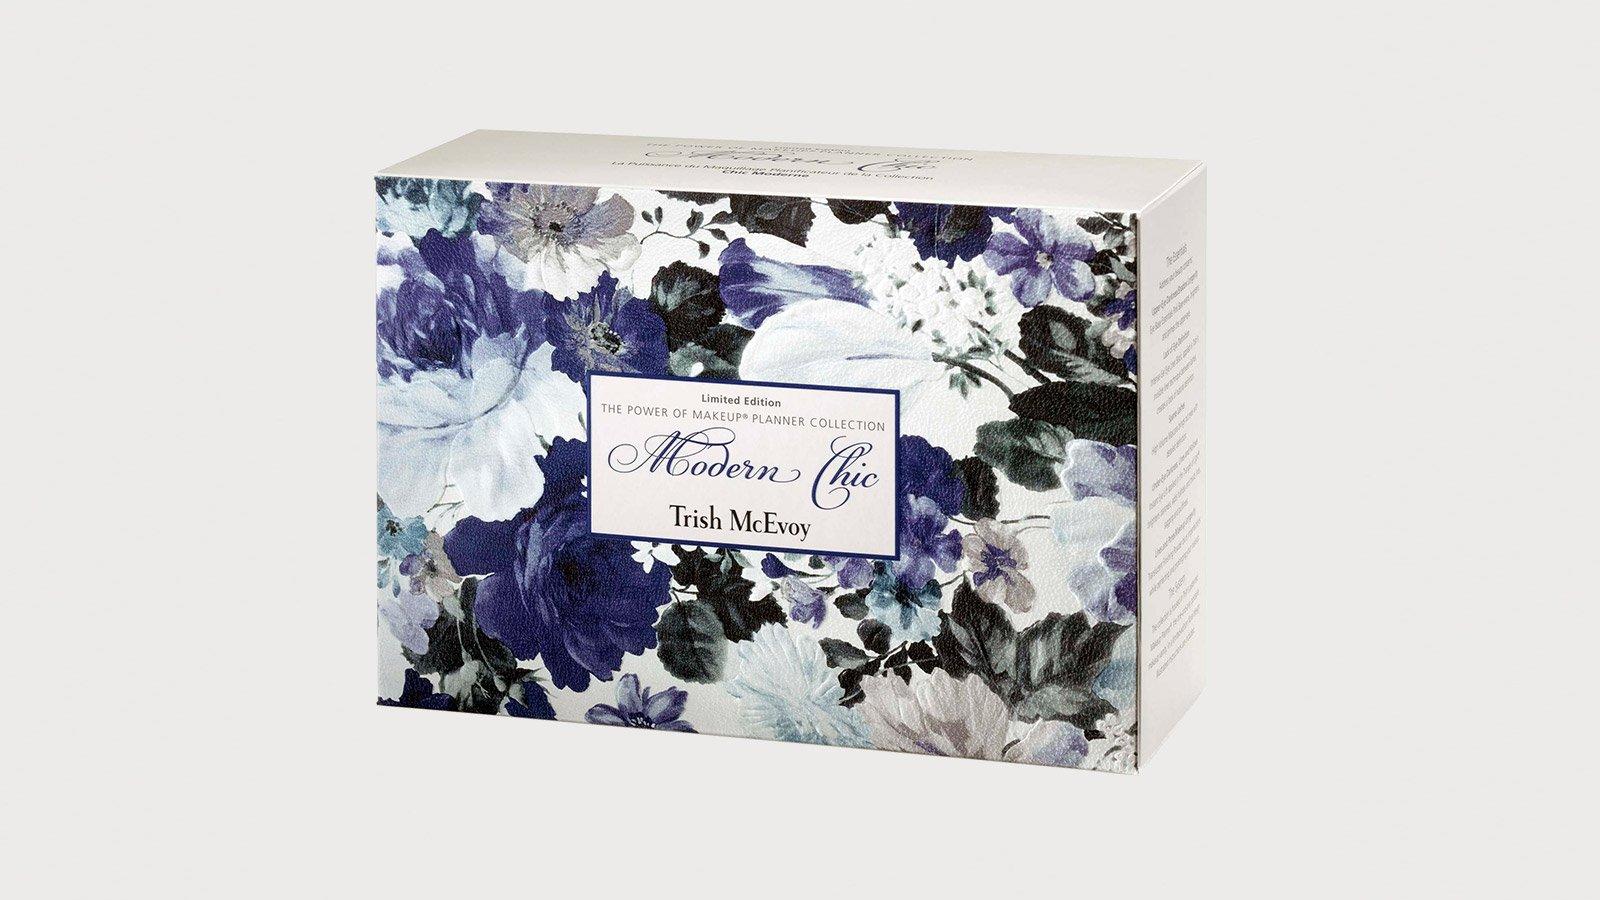 Trish McEvoy's Modern Chic Packaging